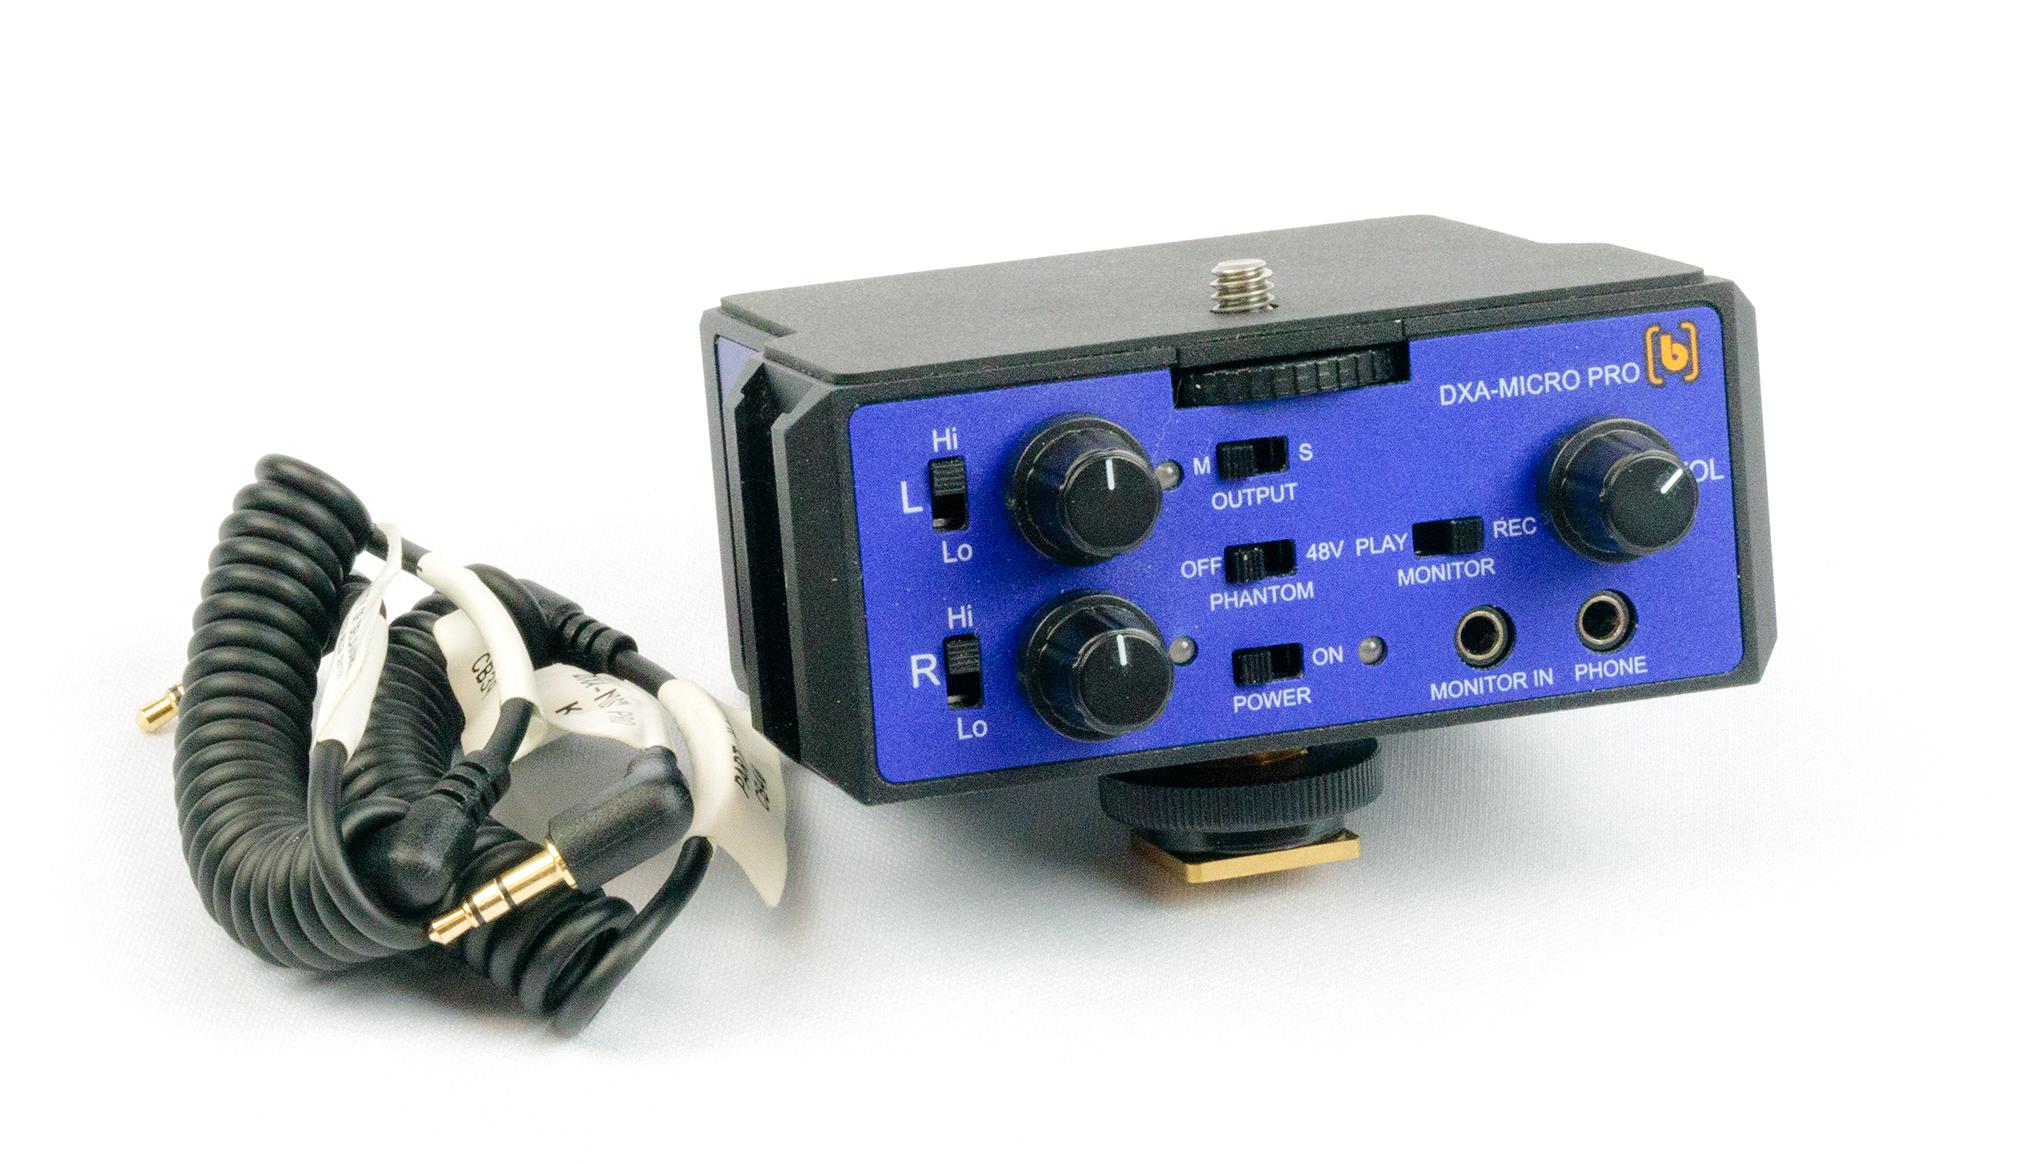 DXA Micro-Pro Photo